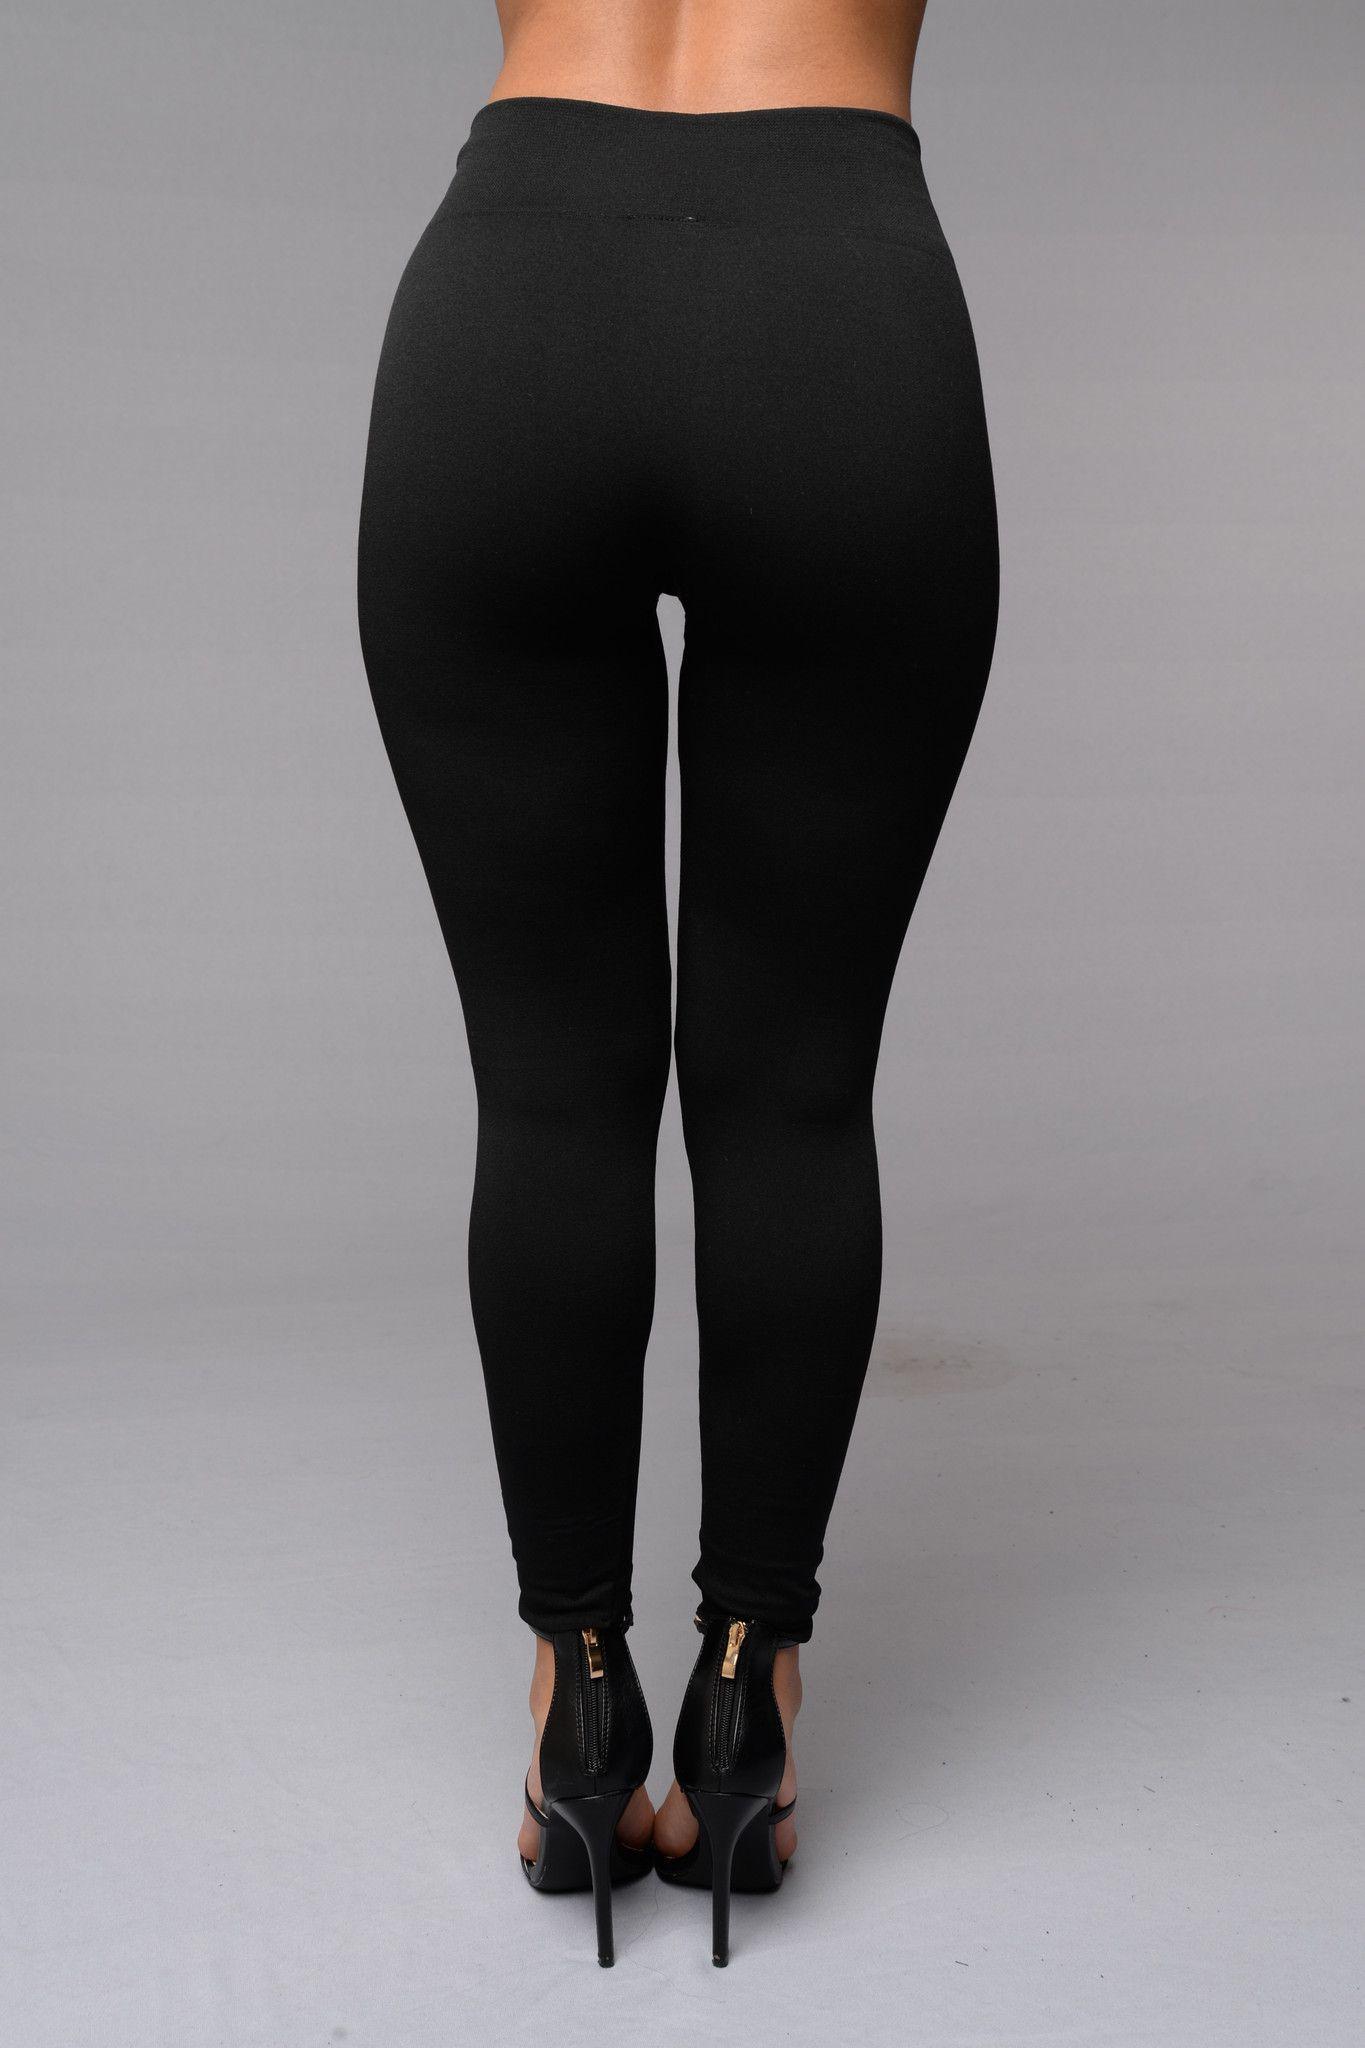 6badd8a567be6 Yes Fleece Leggings - Black   Fashion!!   Fleece leggings, Black ...